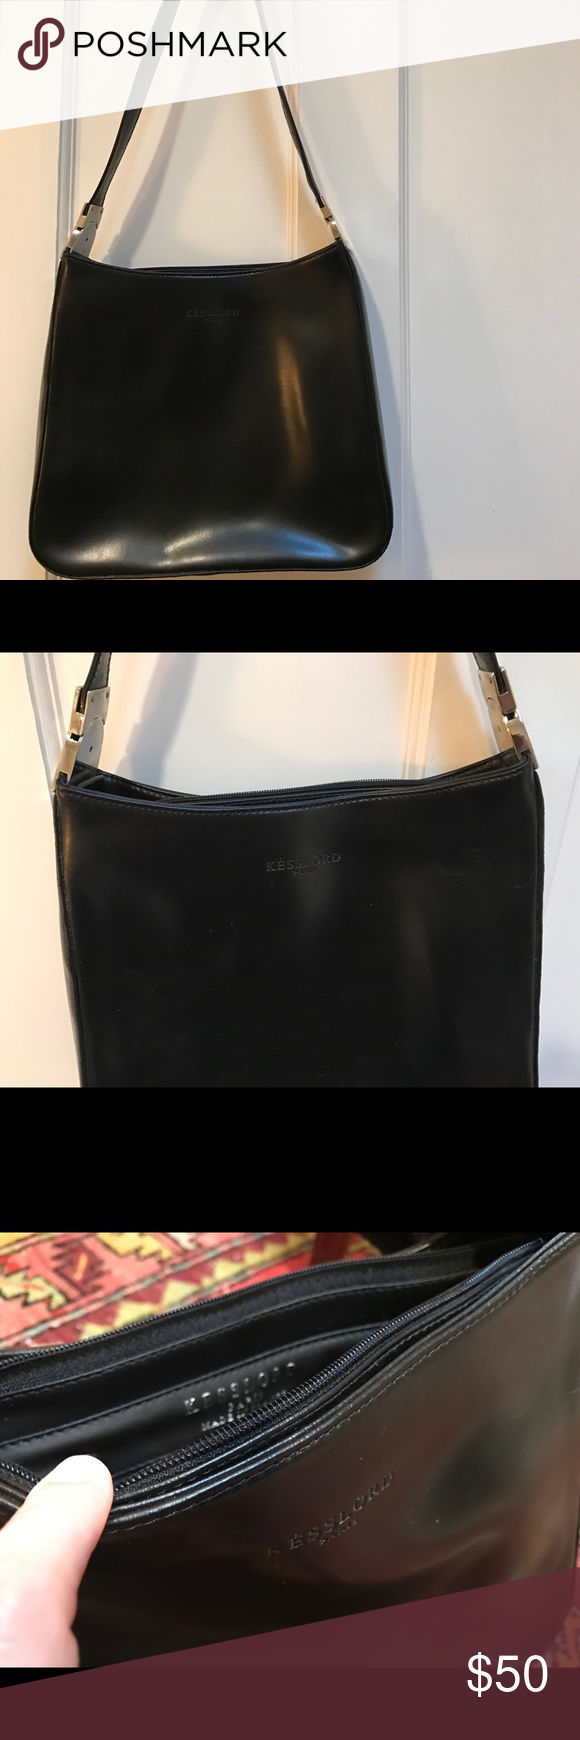 dab60ece48 Kesslord (Paris) black shoulder bag 😍 Clean inside and out